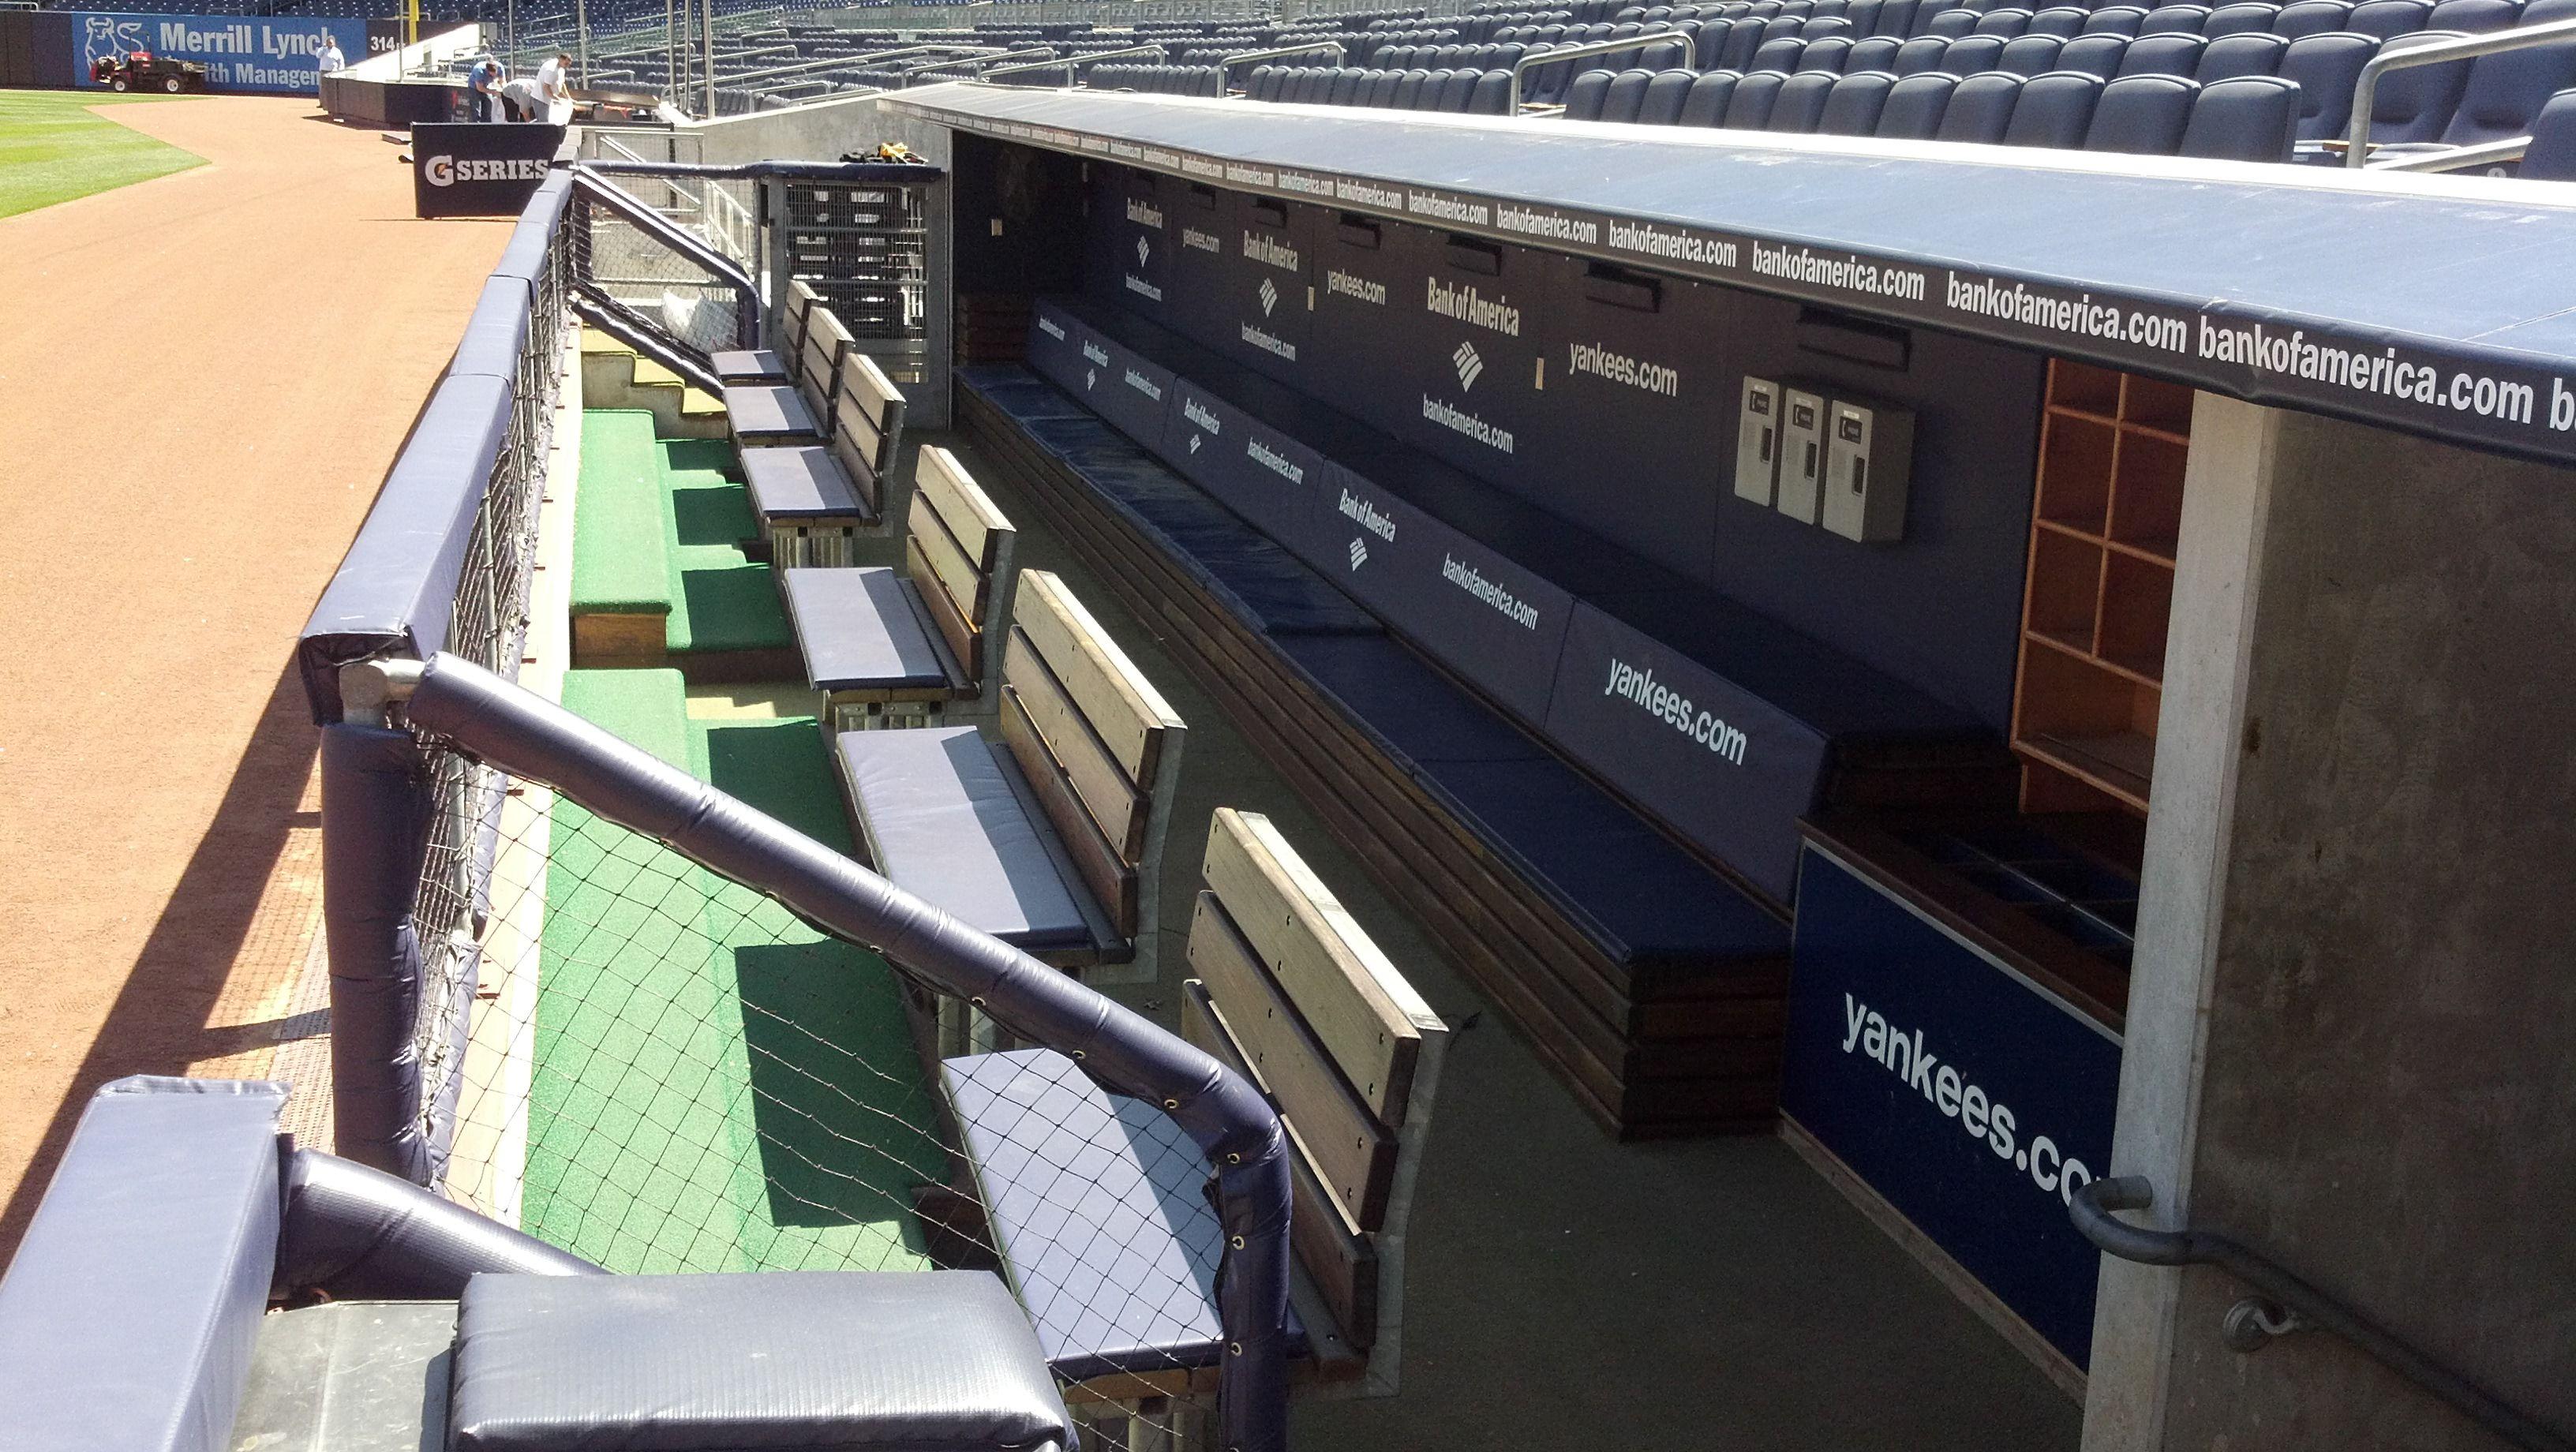 the dugout at Yankee Stadium